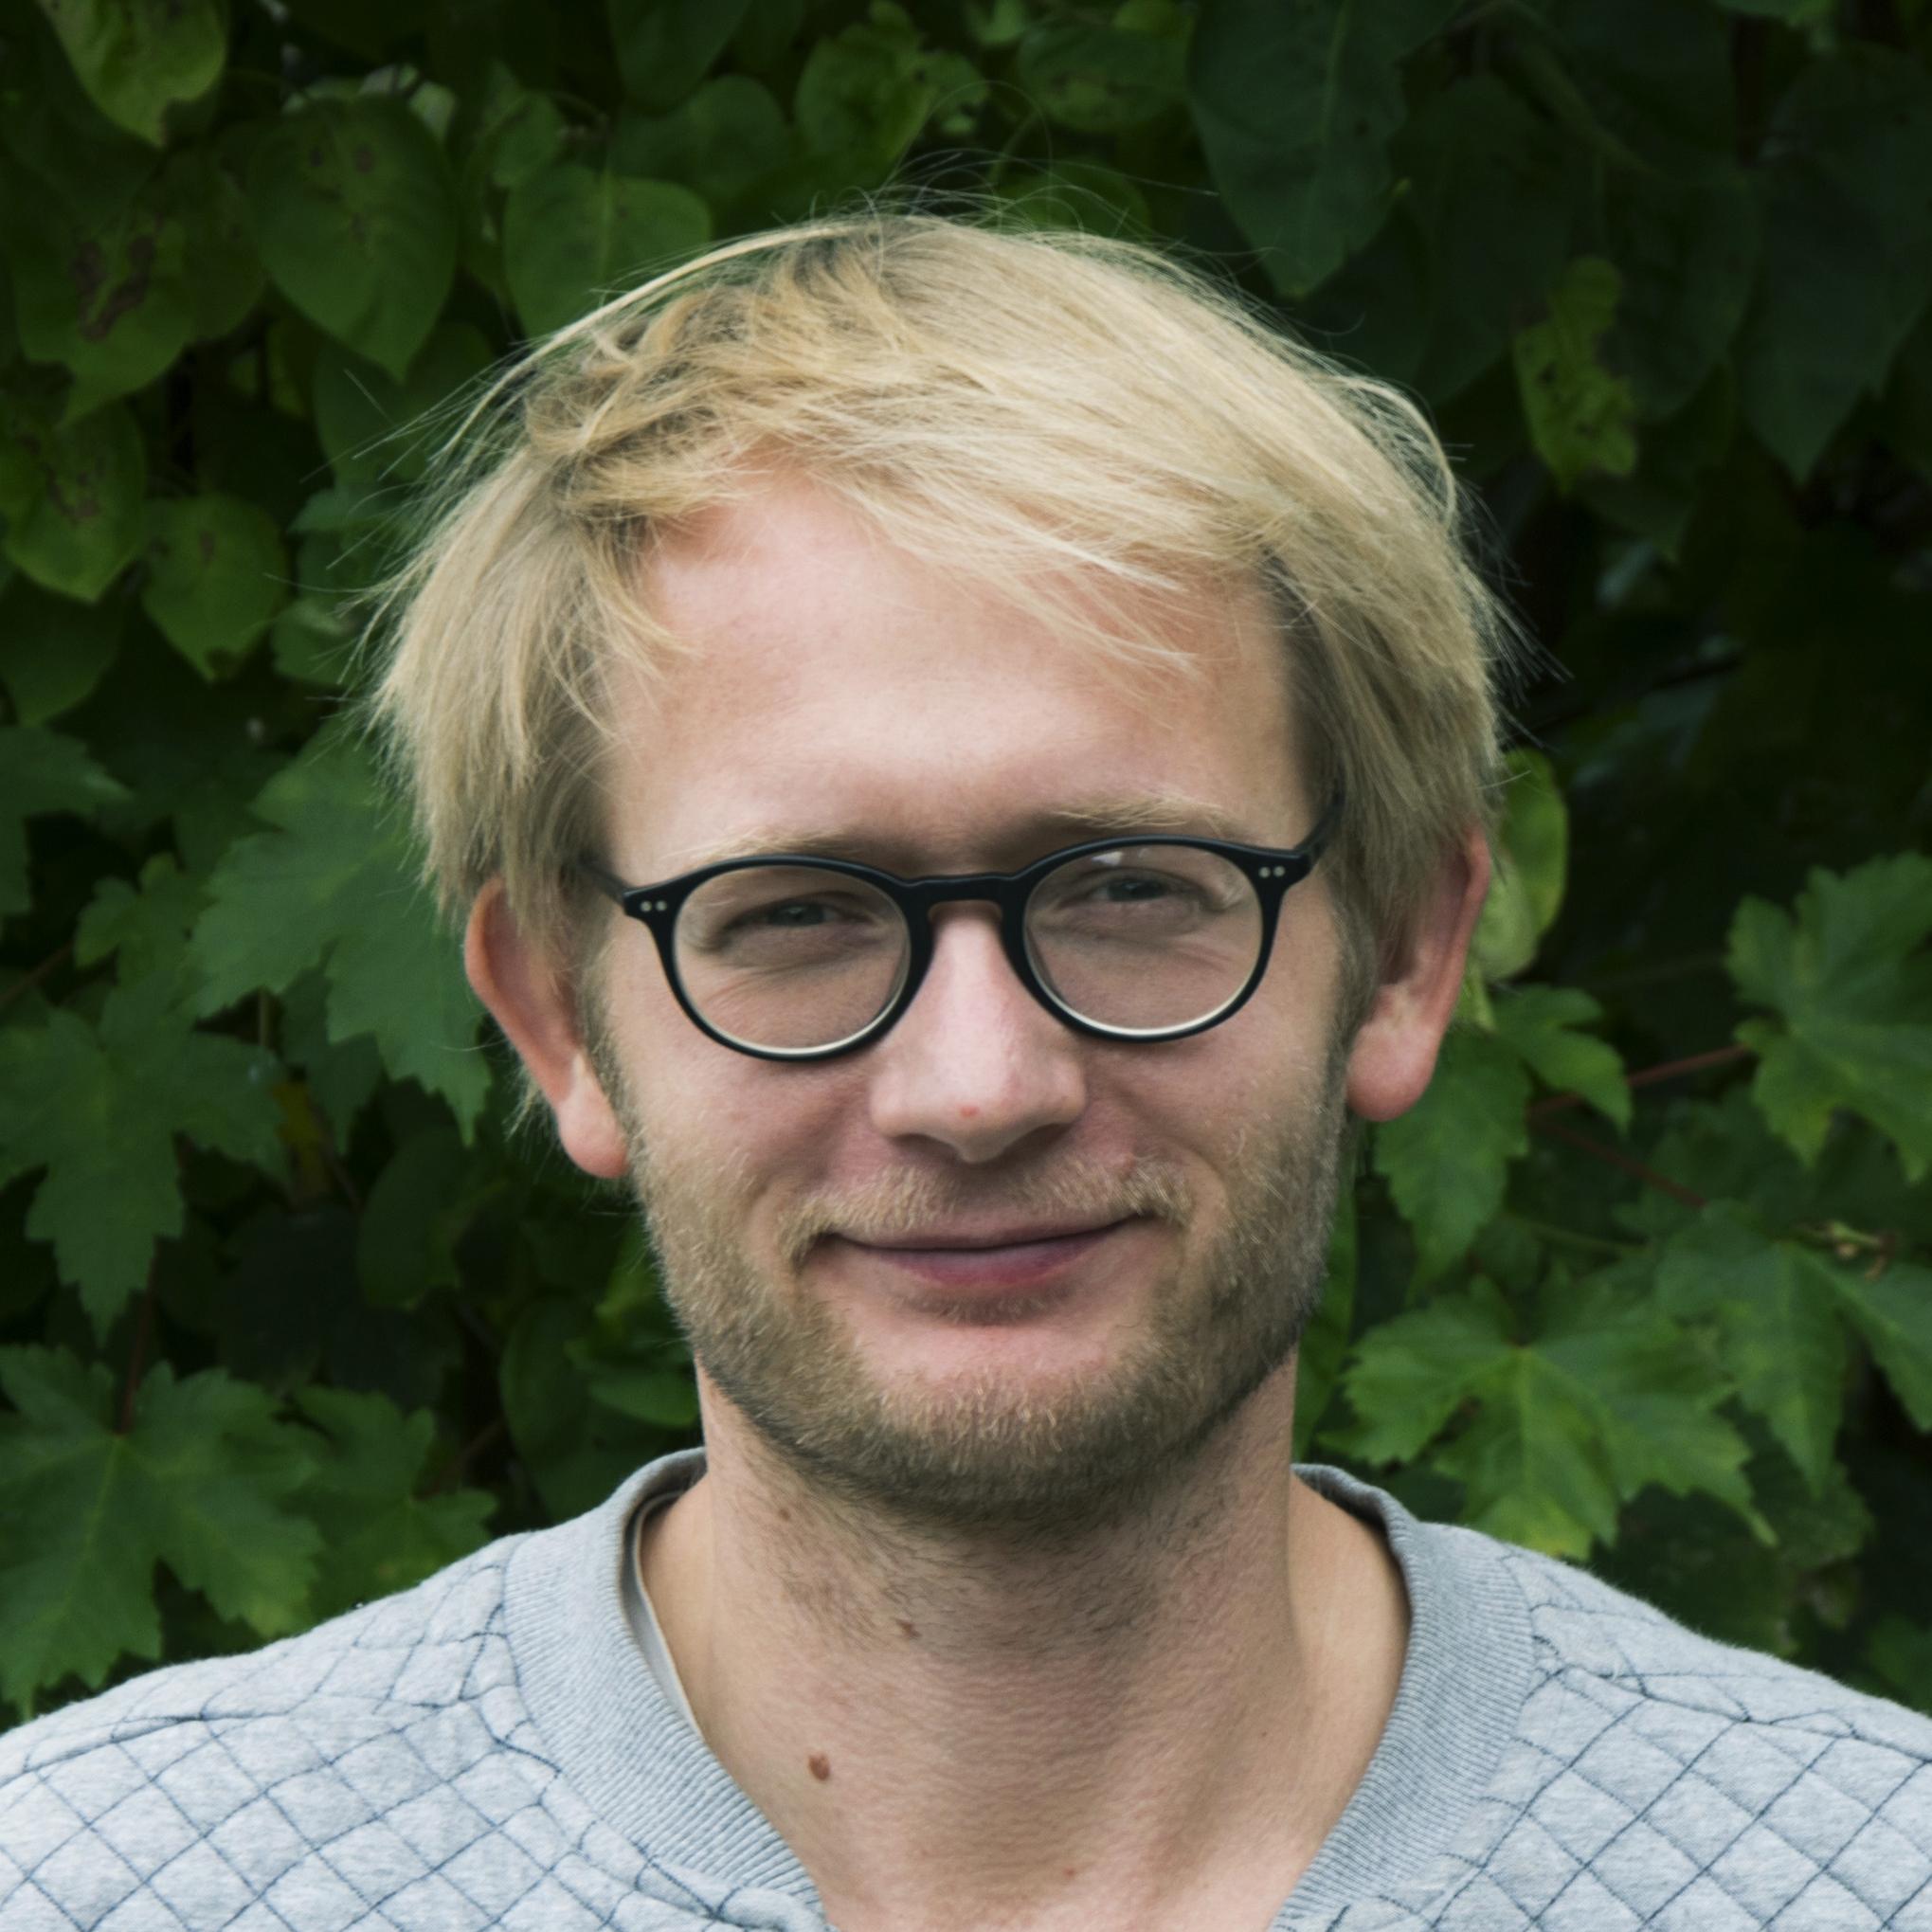 Peter Høyerup